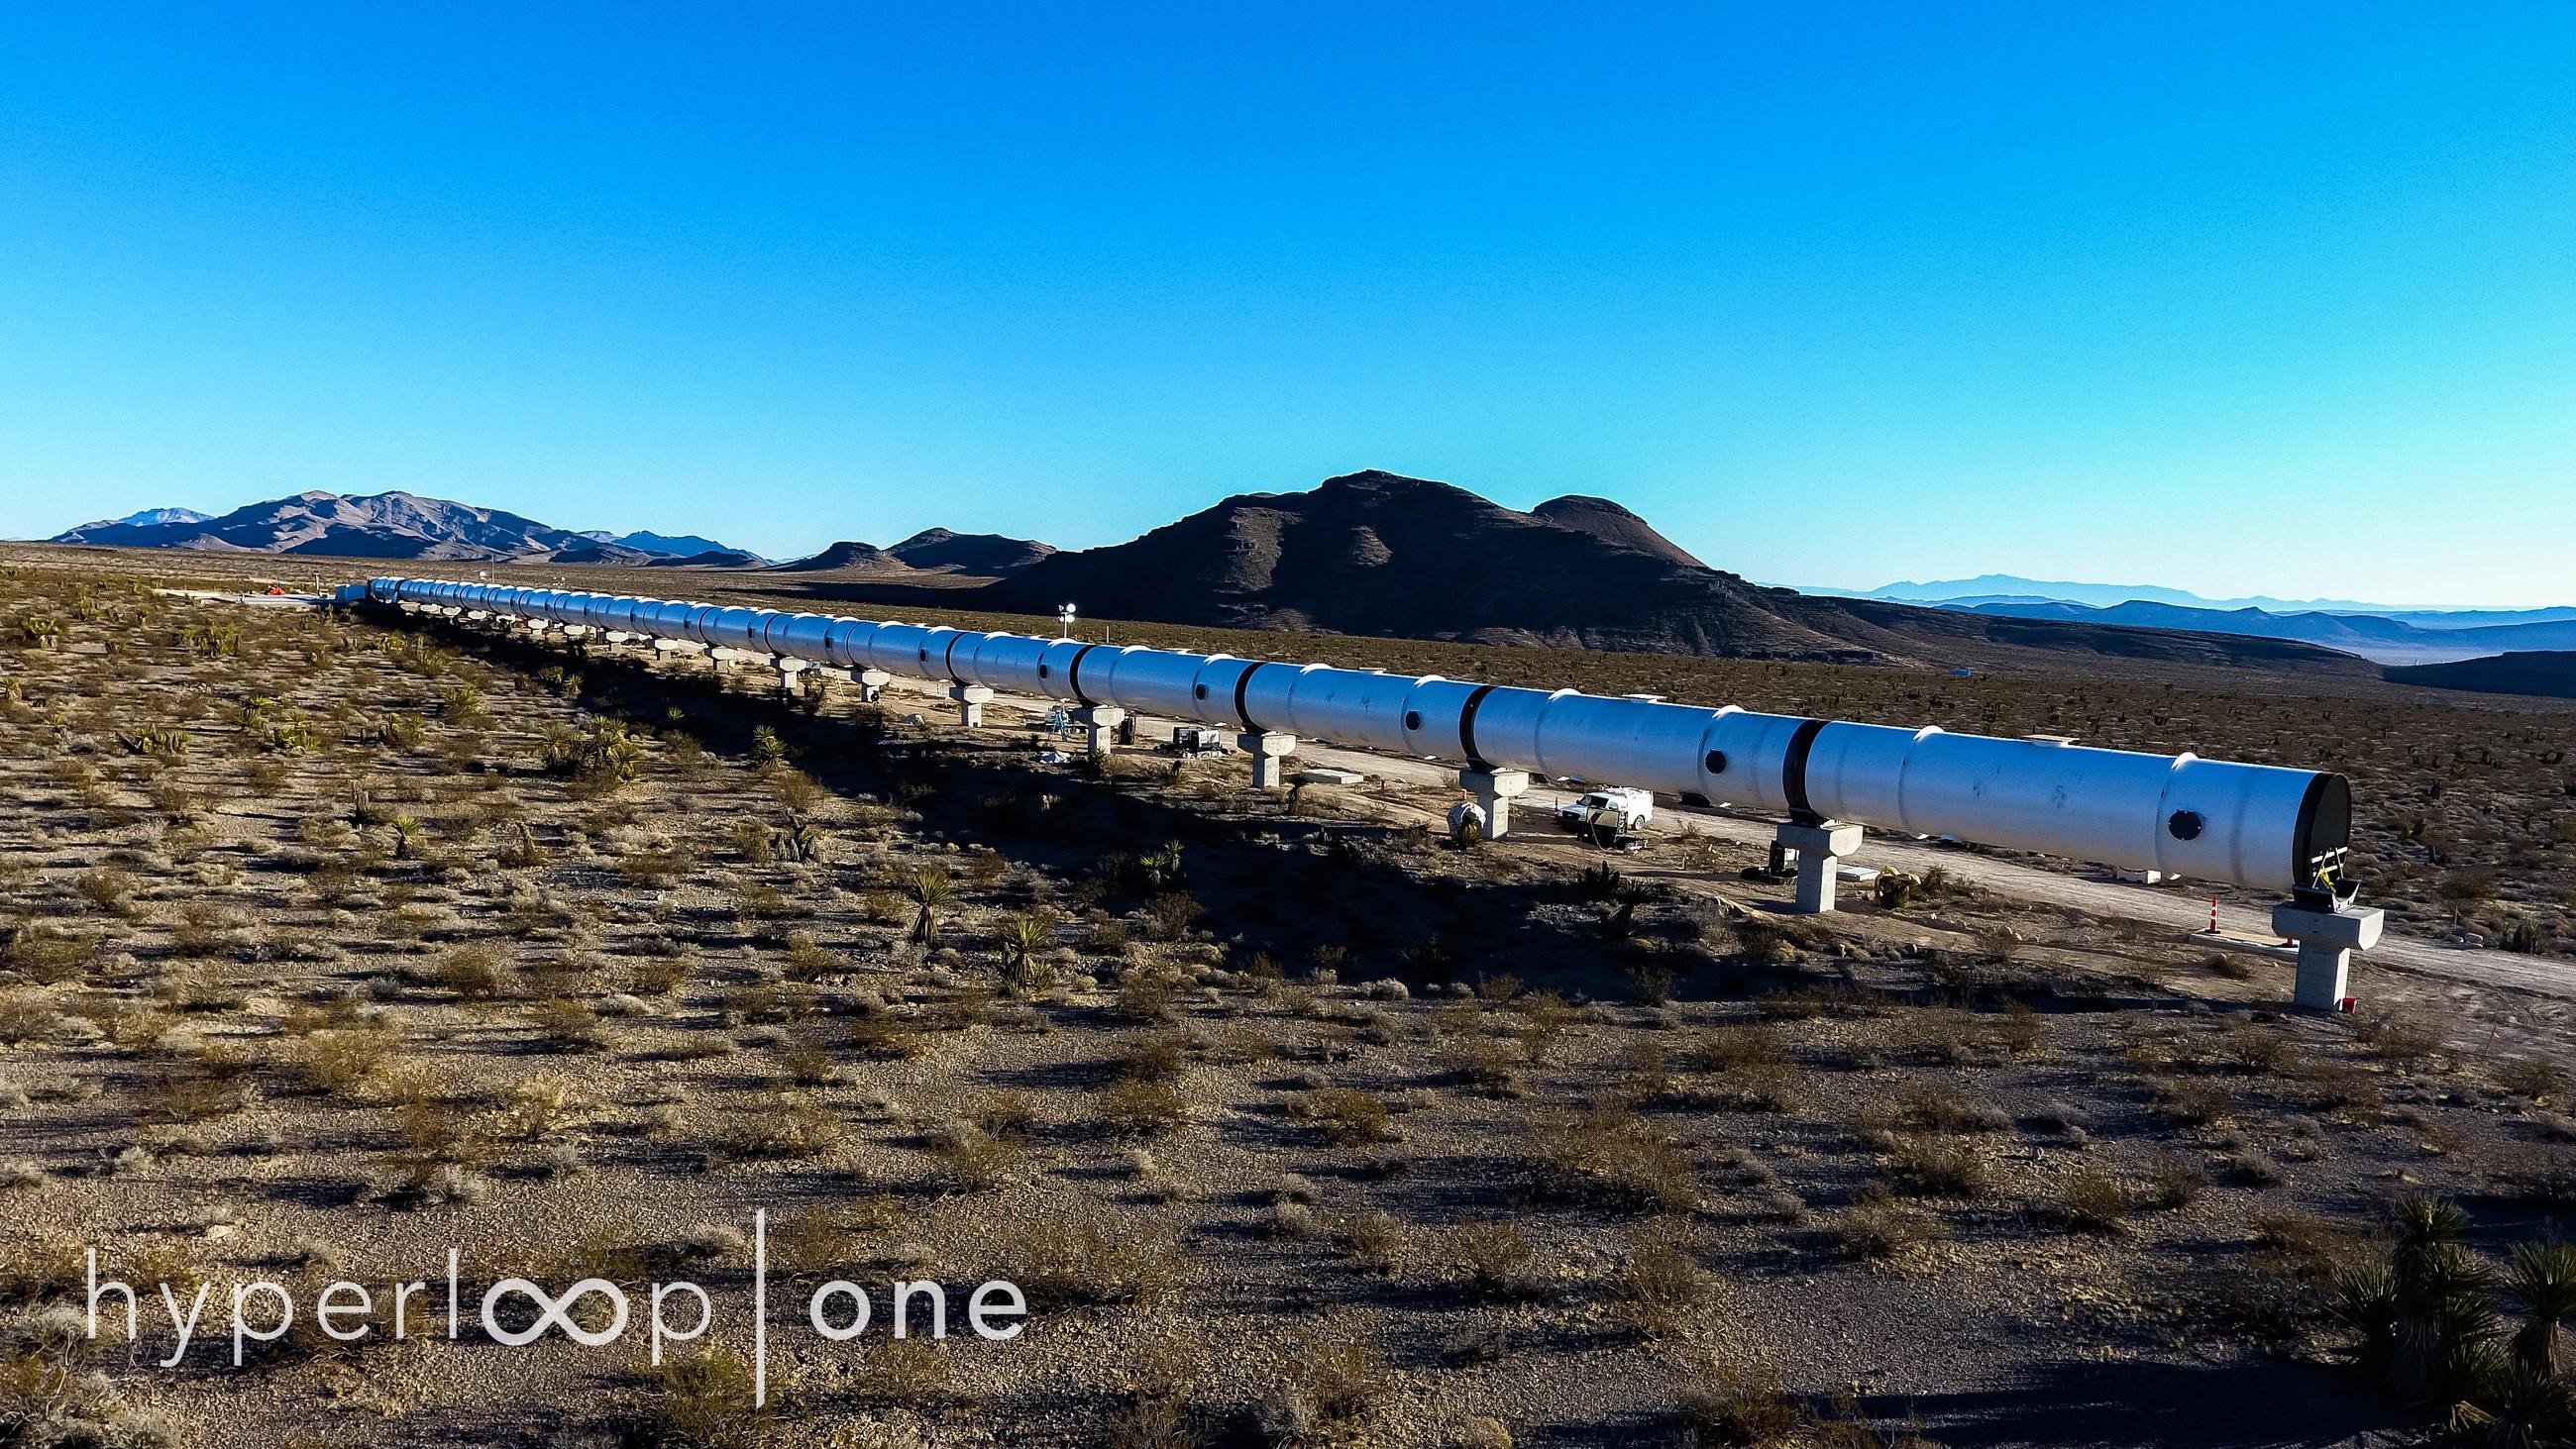 hyperloop-one-test-track-nevada-5